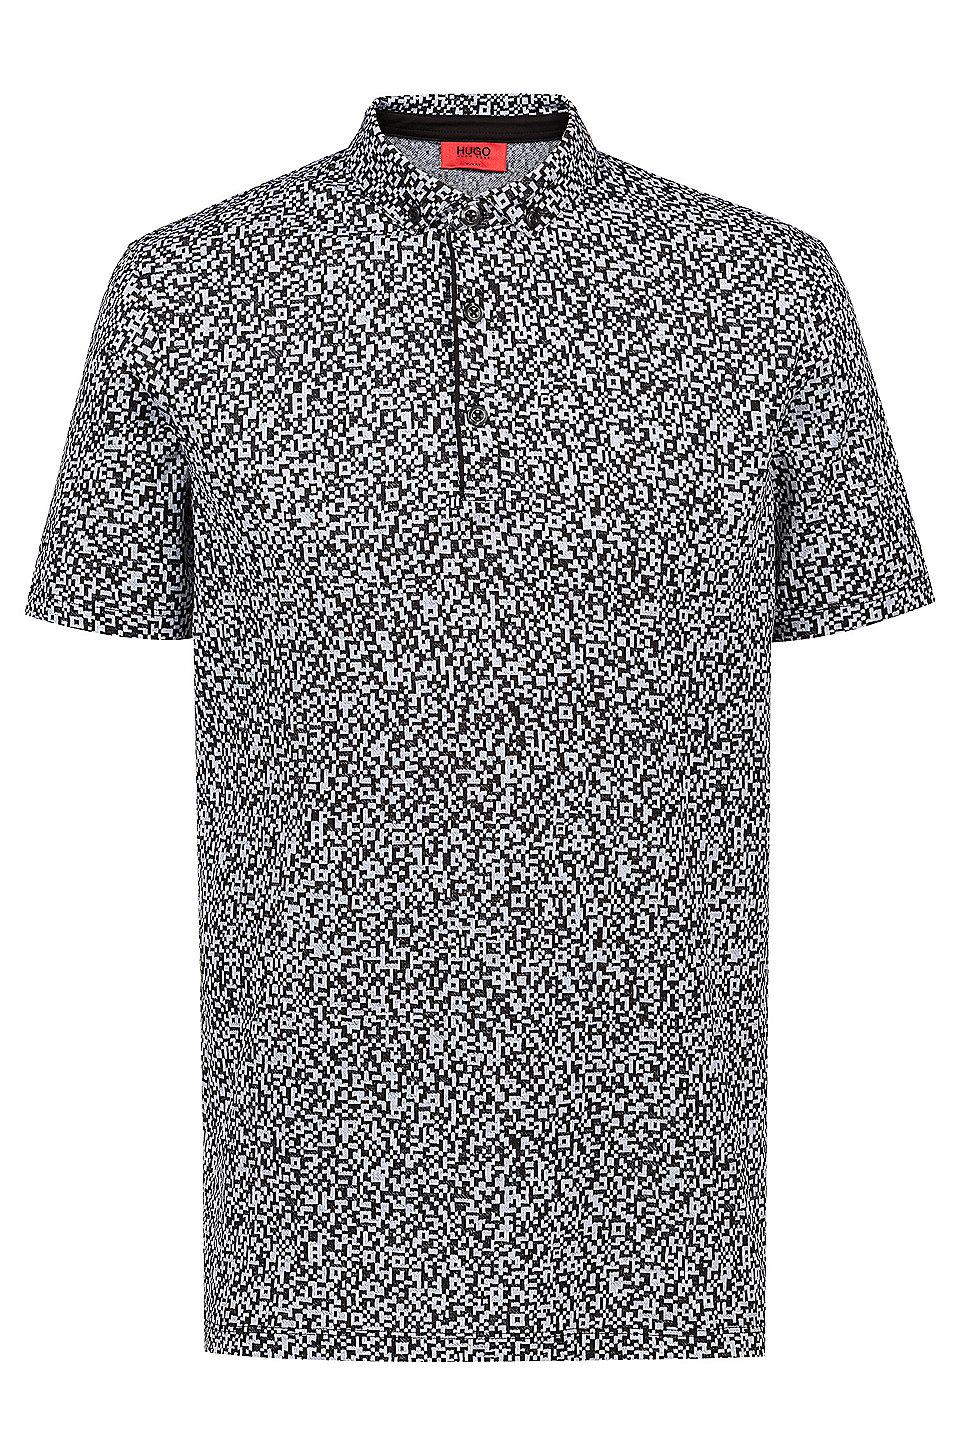 276869bf HUGO - Slim-fit polo shirt in mercerized cotton jacquard